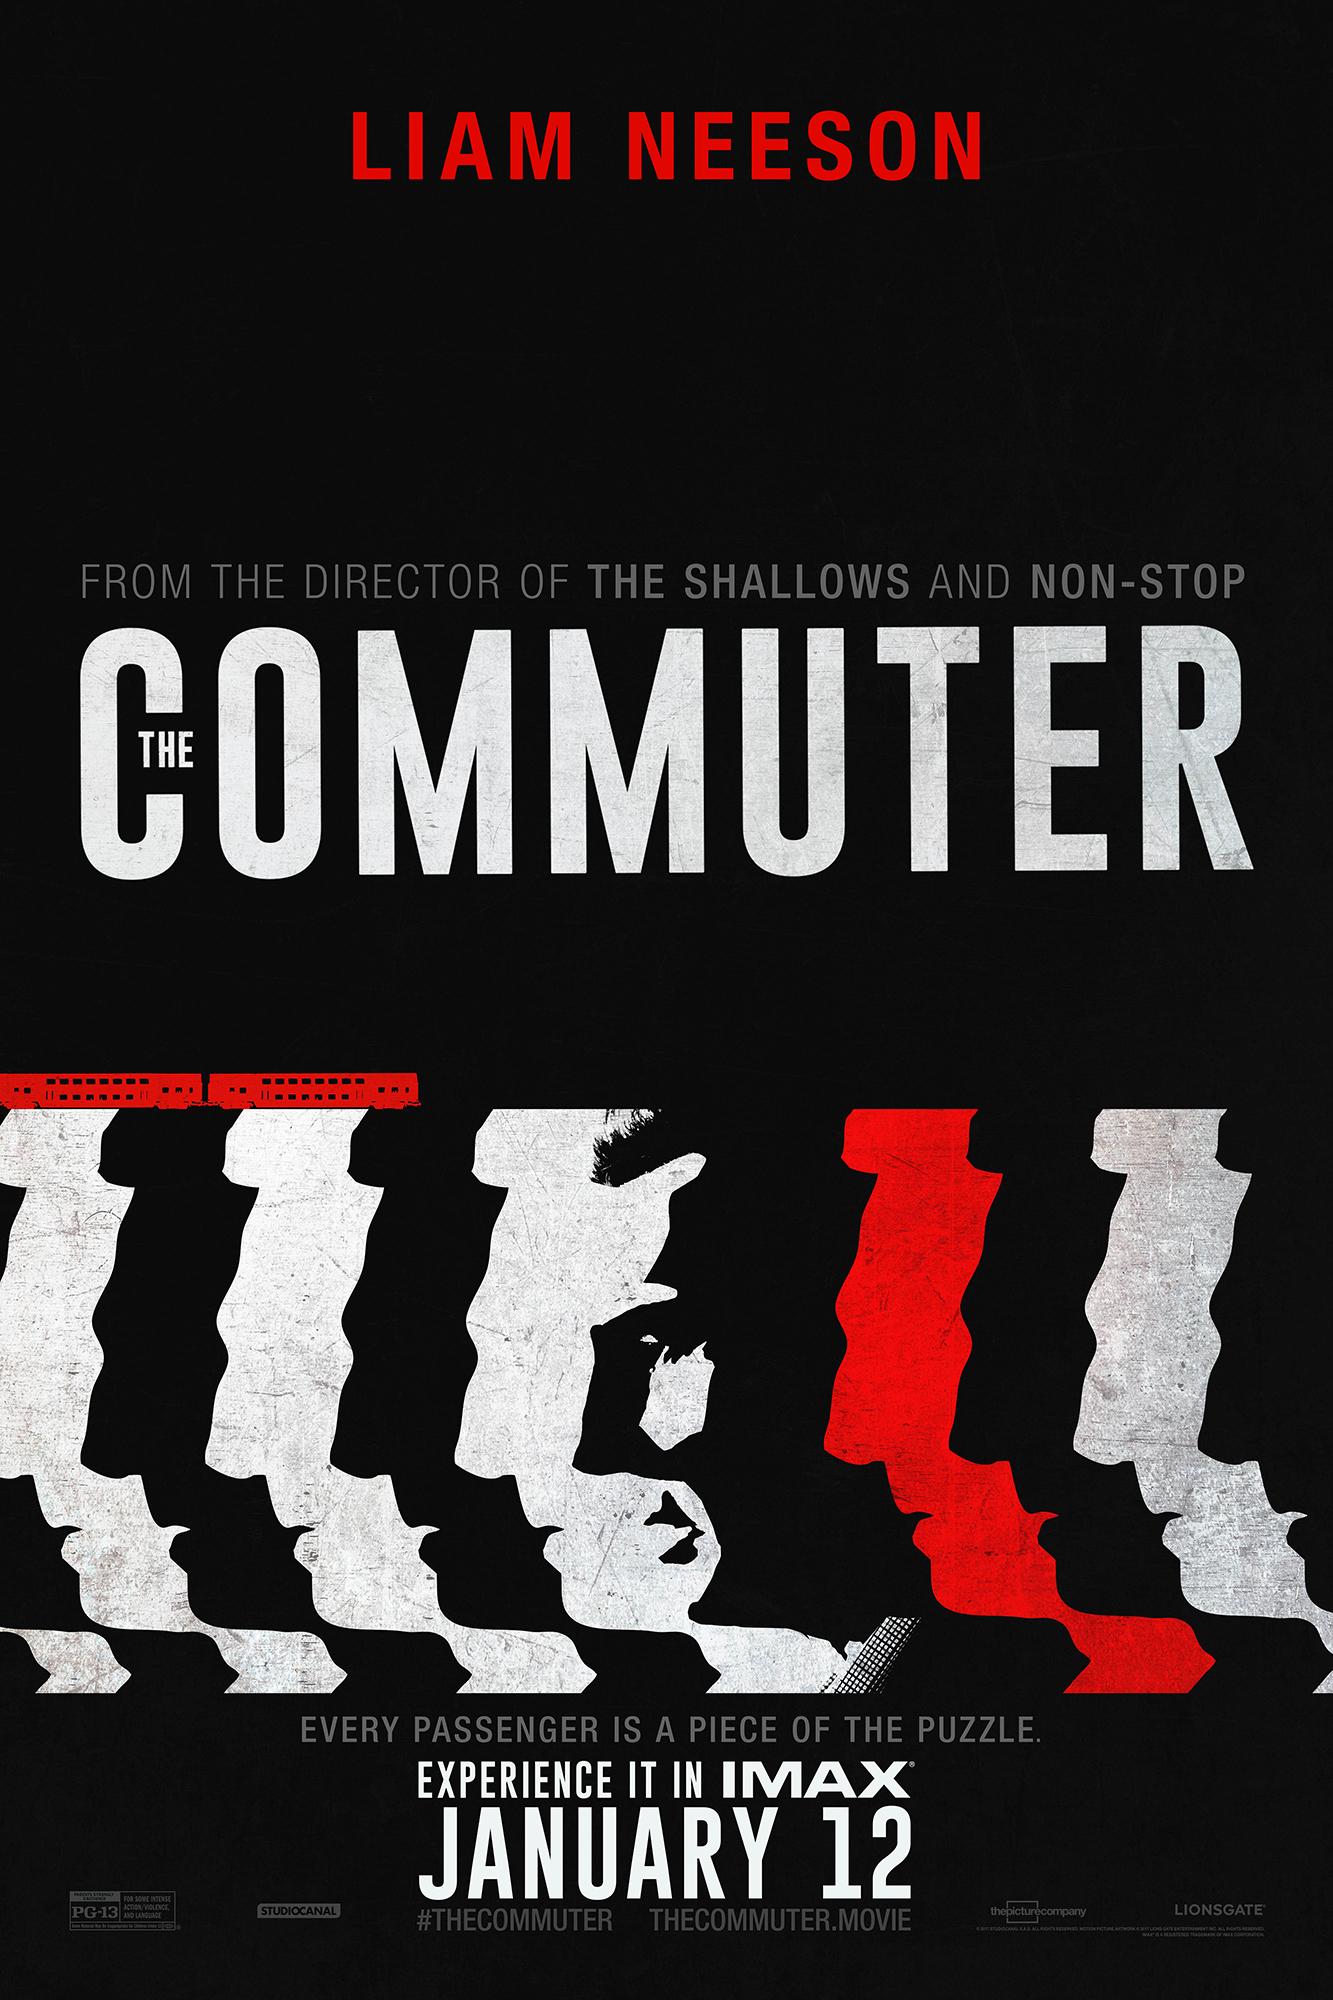 FIN05_Commuter_Wildpost_Profiles_422.jpg